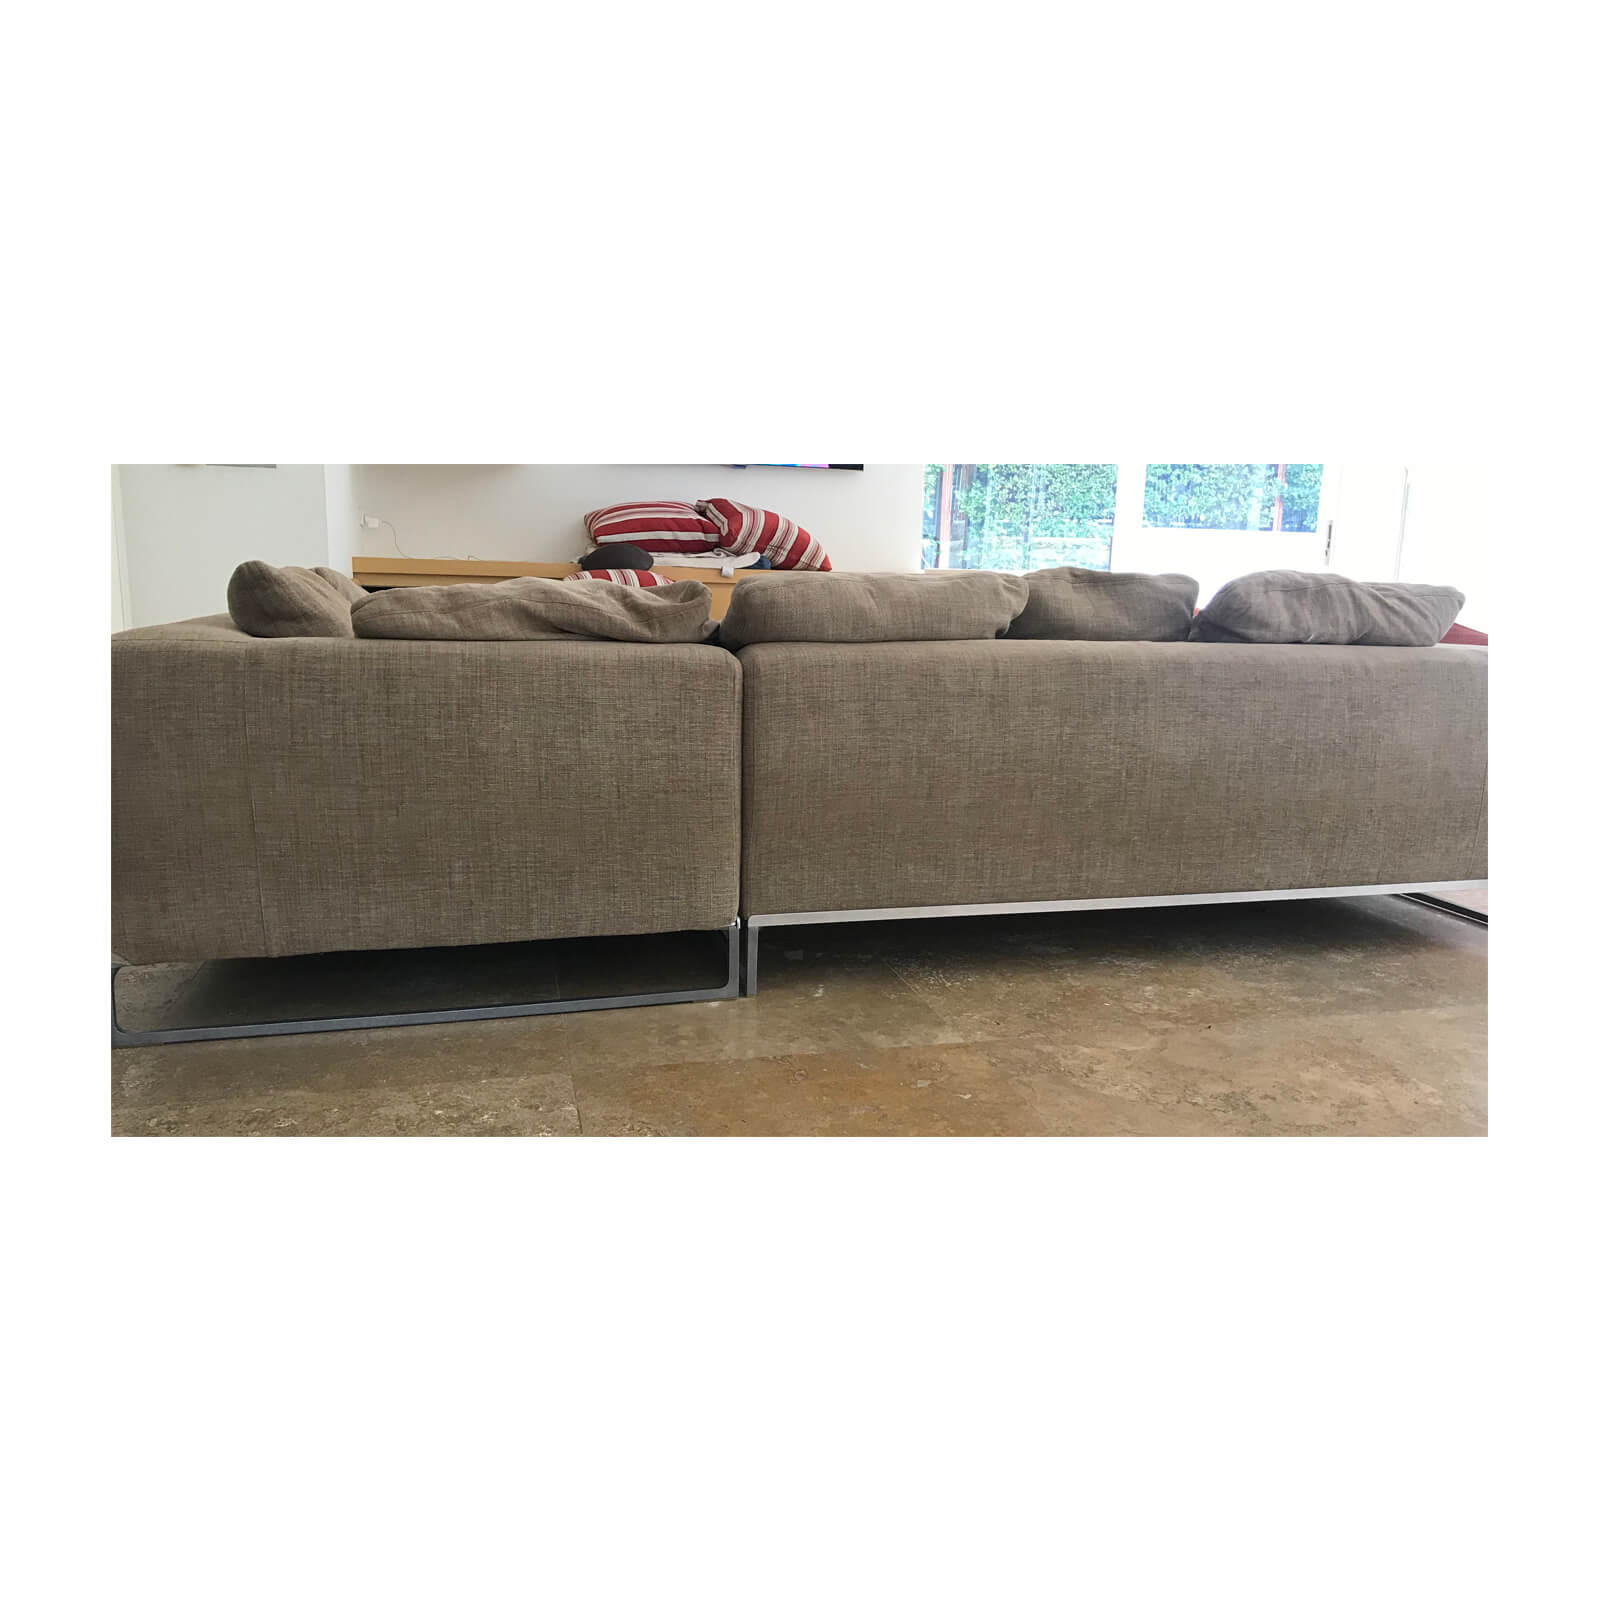 Two Design Lovers B&B Italia Dadone sofa 8